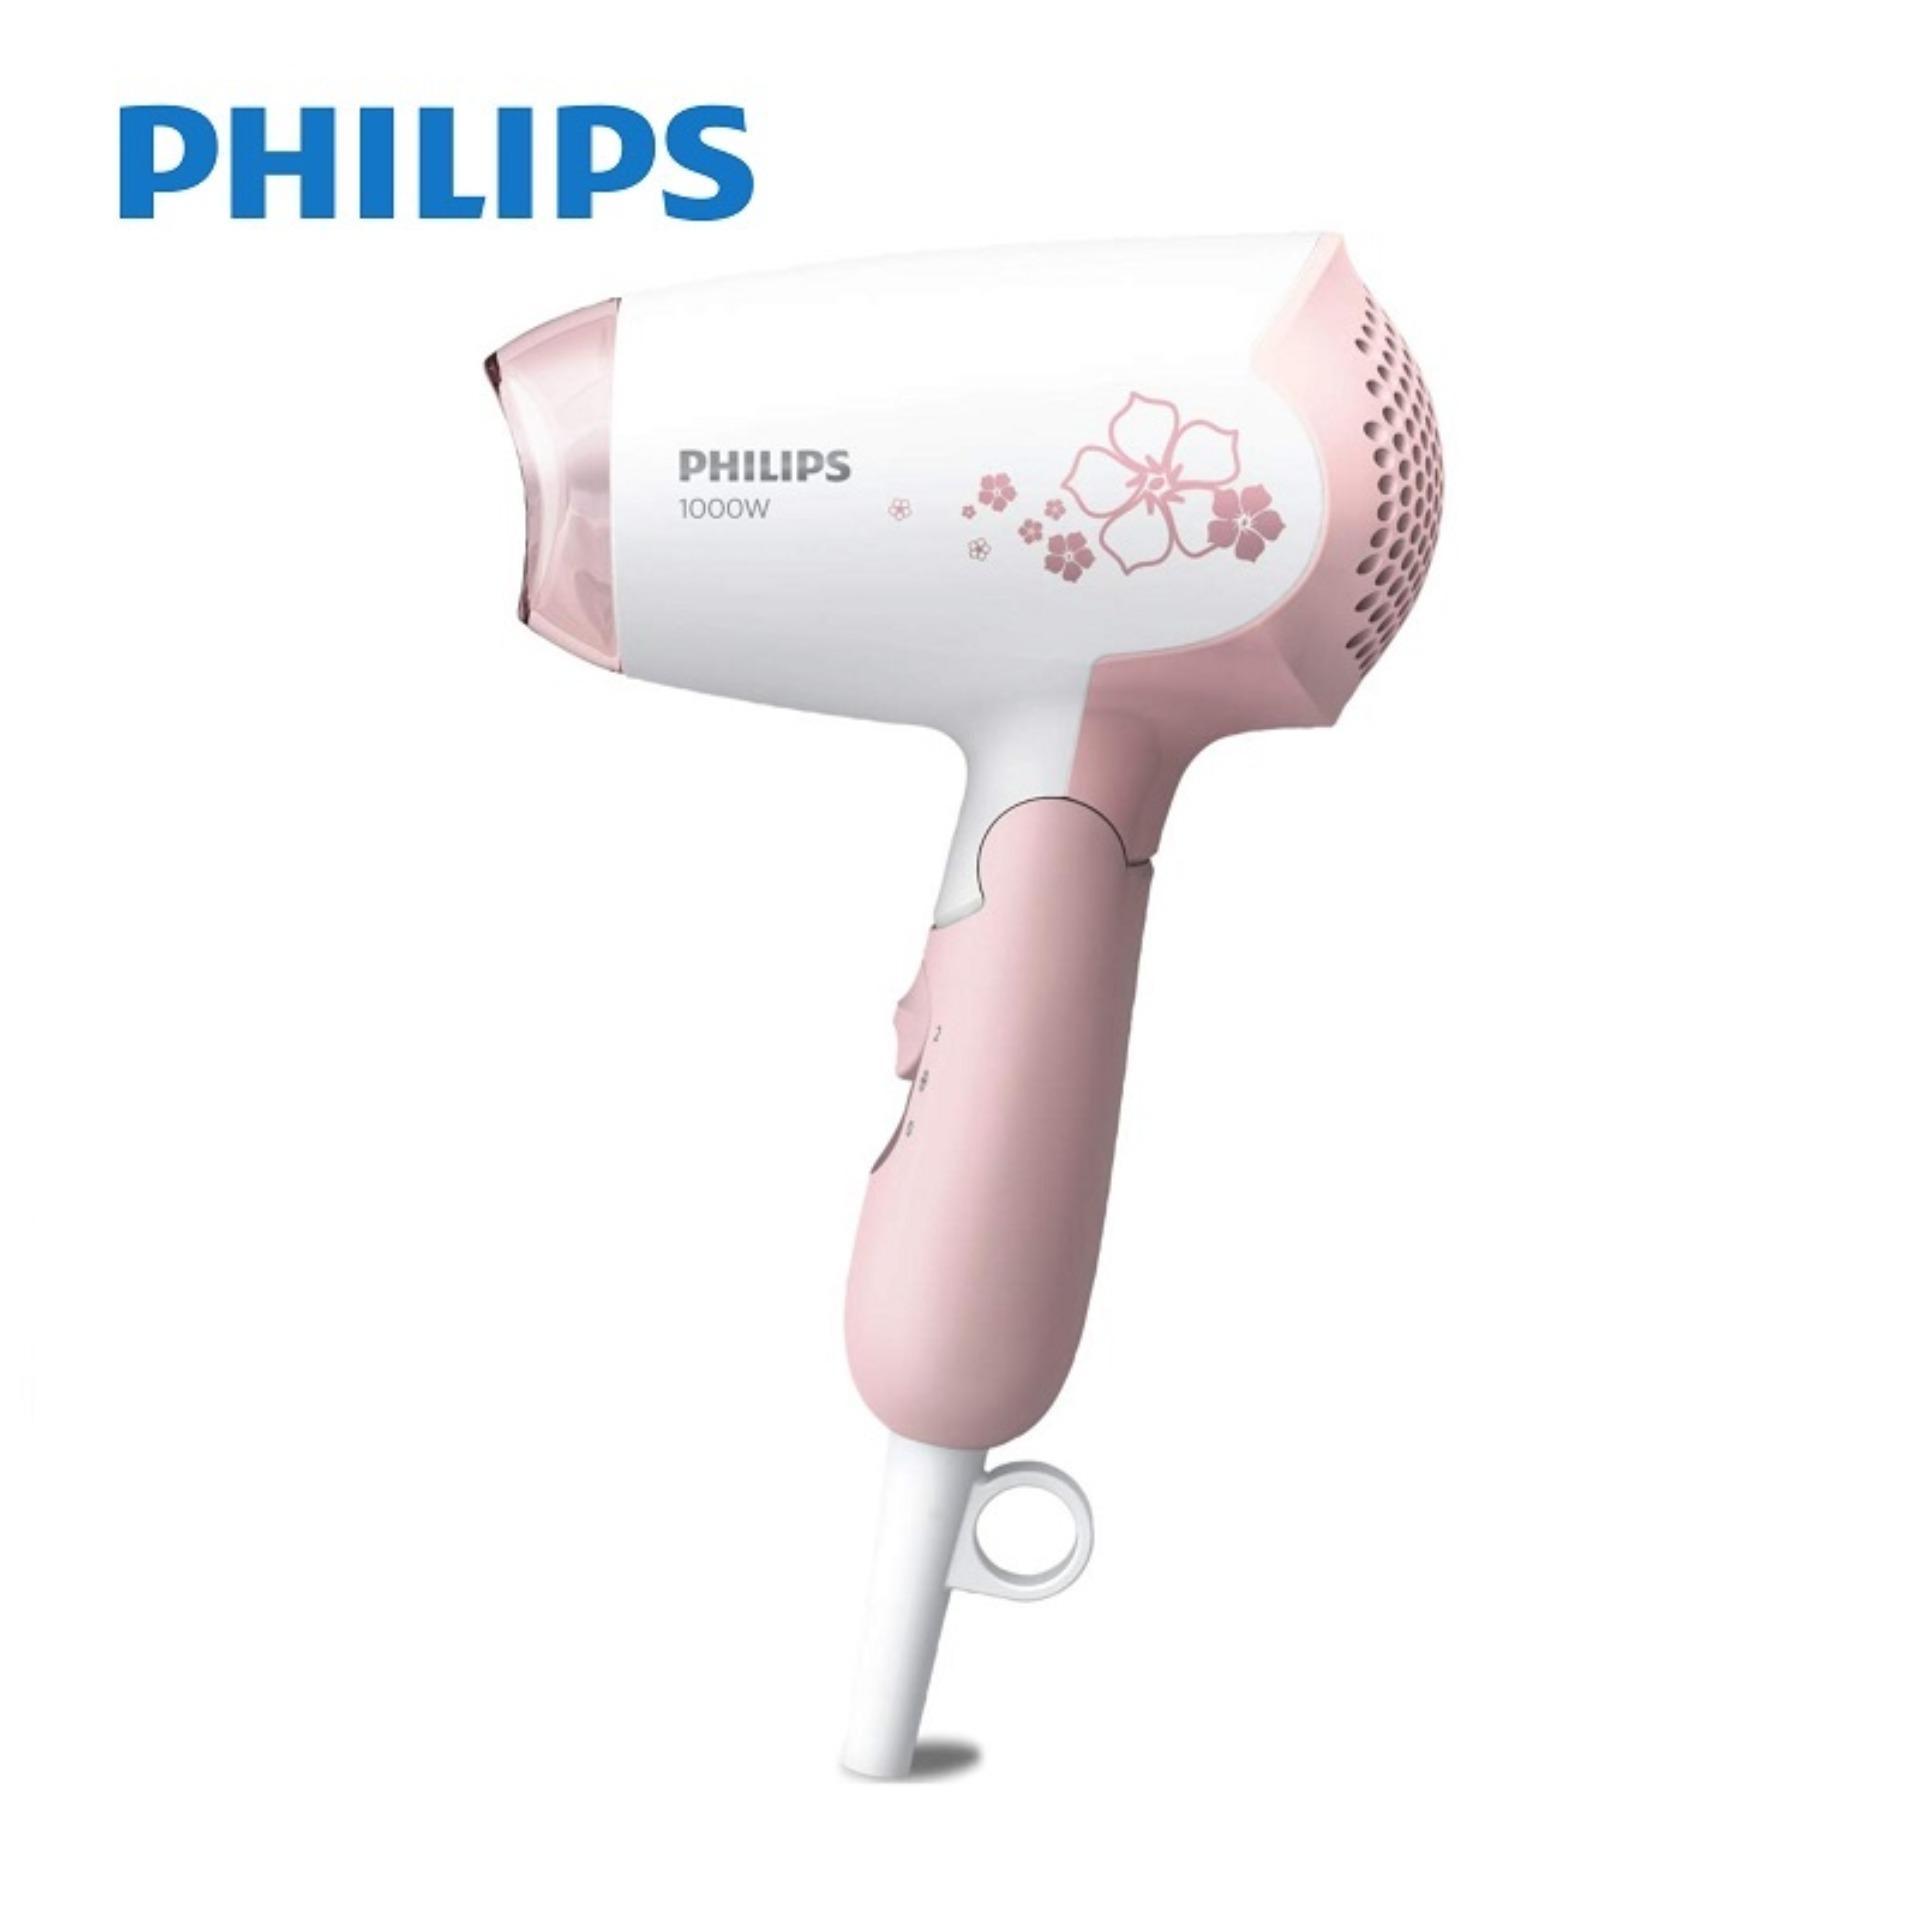 Philips HP8108/03 Hairdryer (White/Pink)